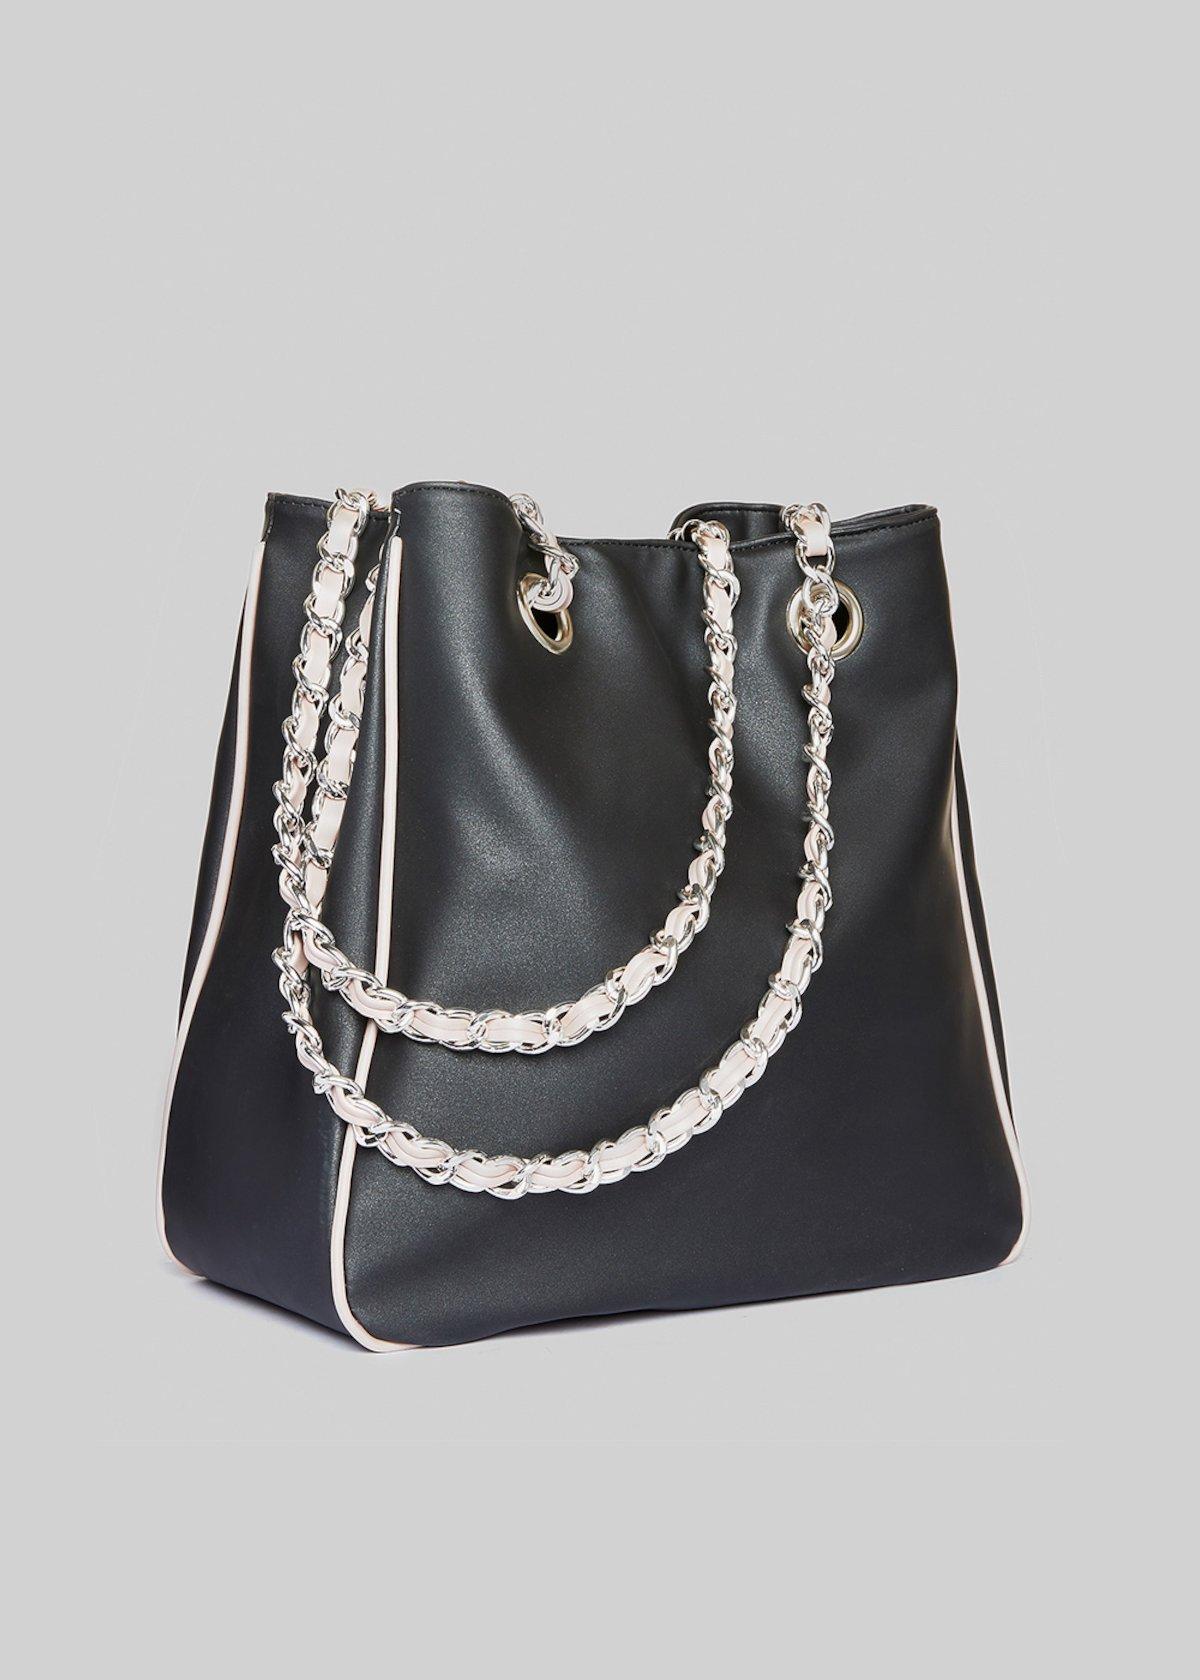 Minirubbe Rubber Satin Faux Leather Shopping Bag  e1127fdb8f3